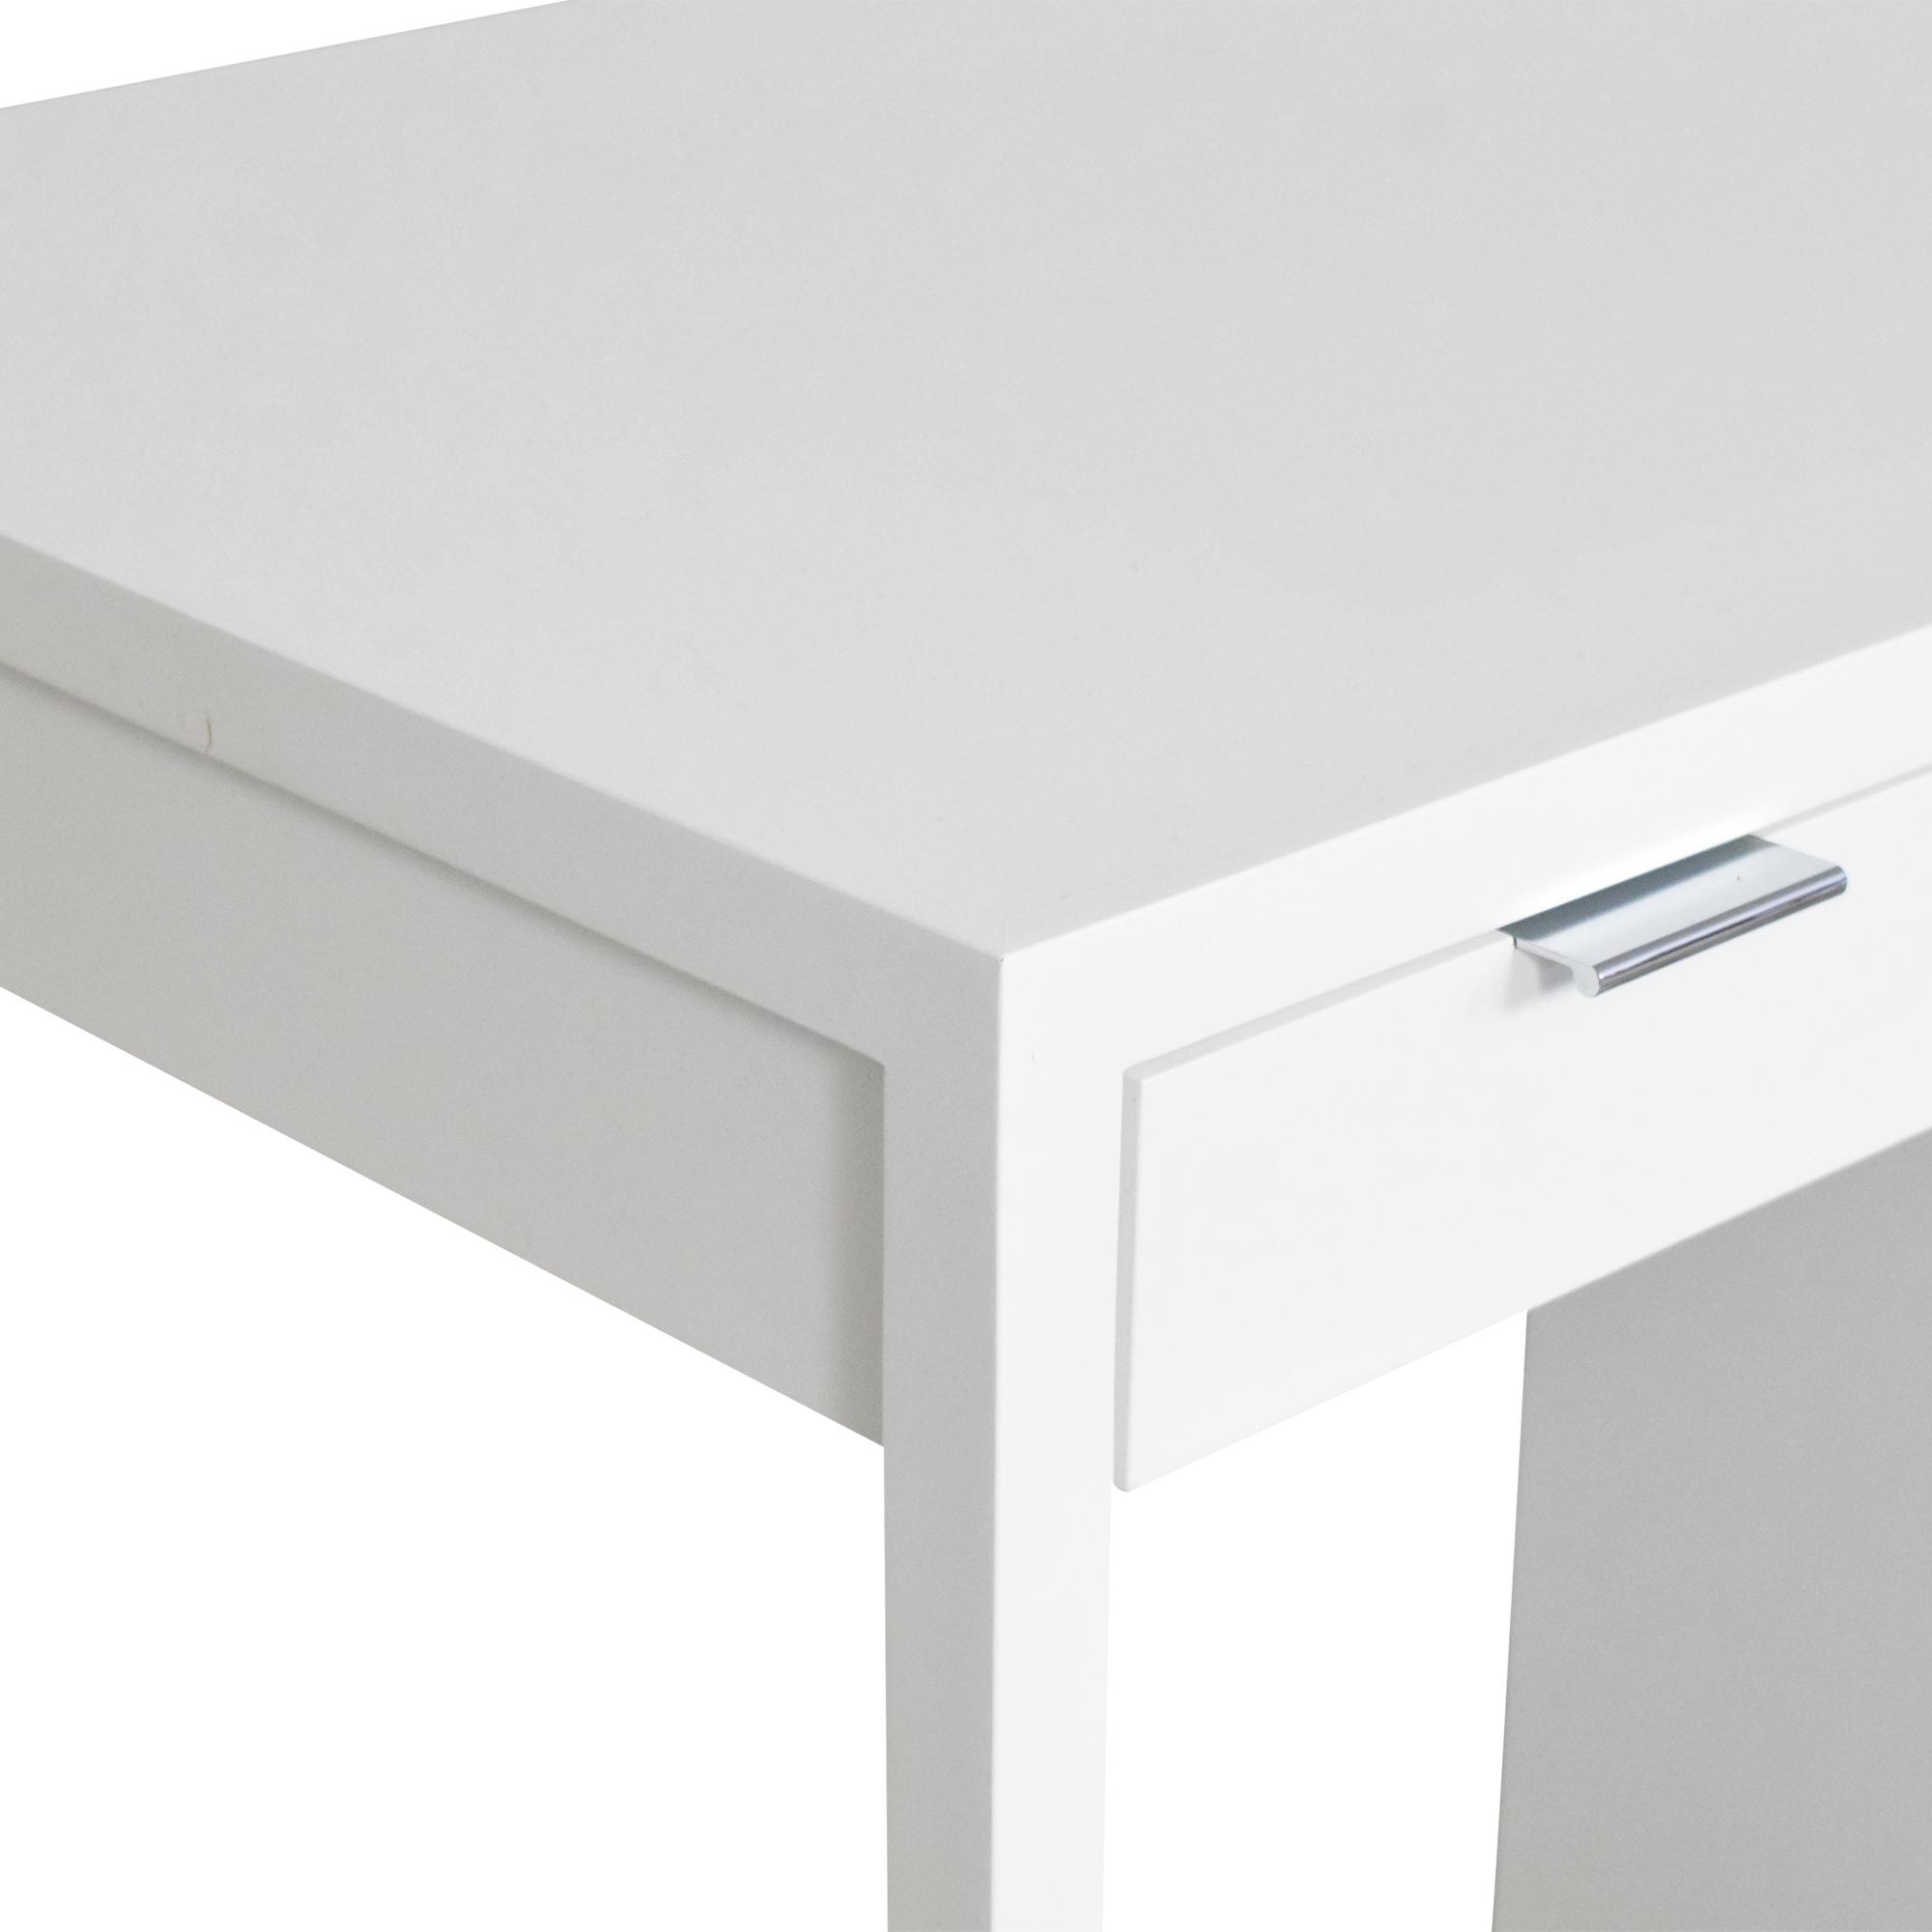 Custom Desk with Storage nj